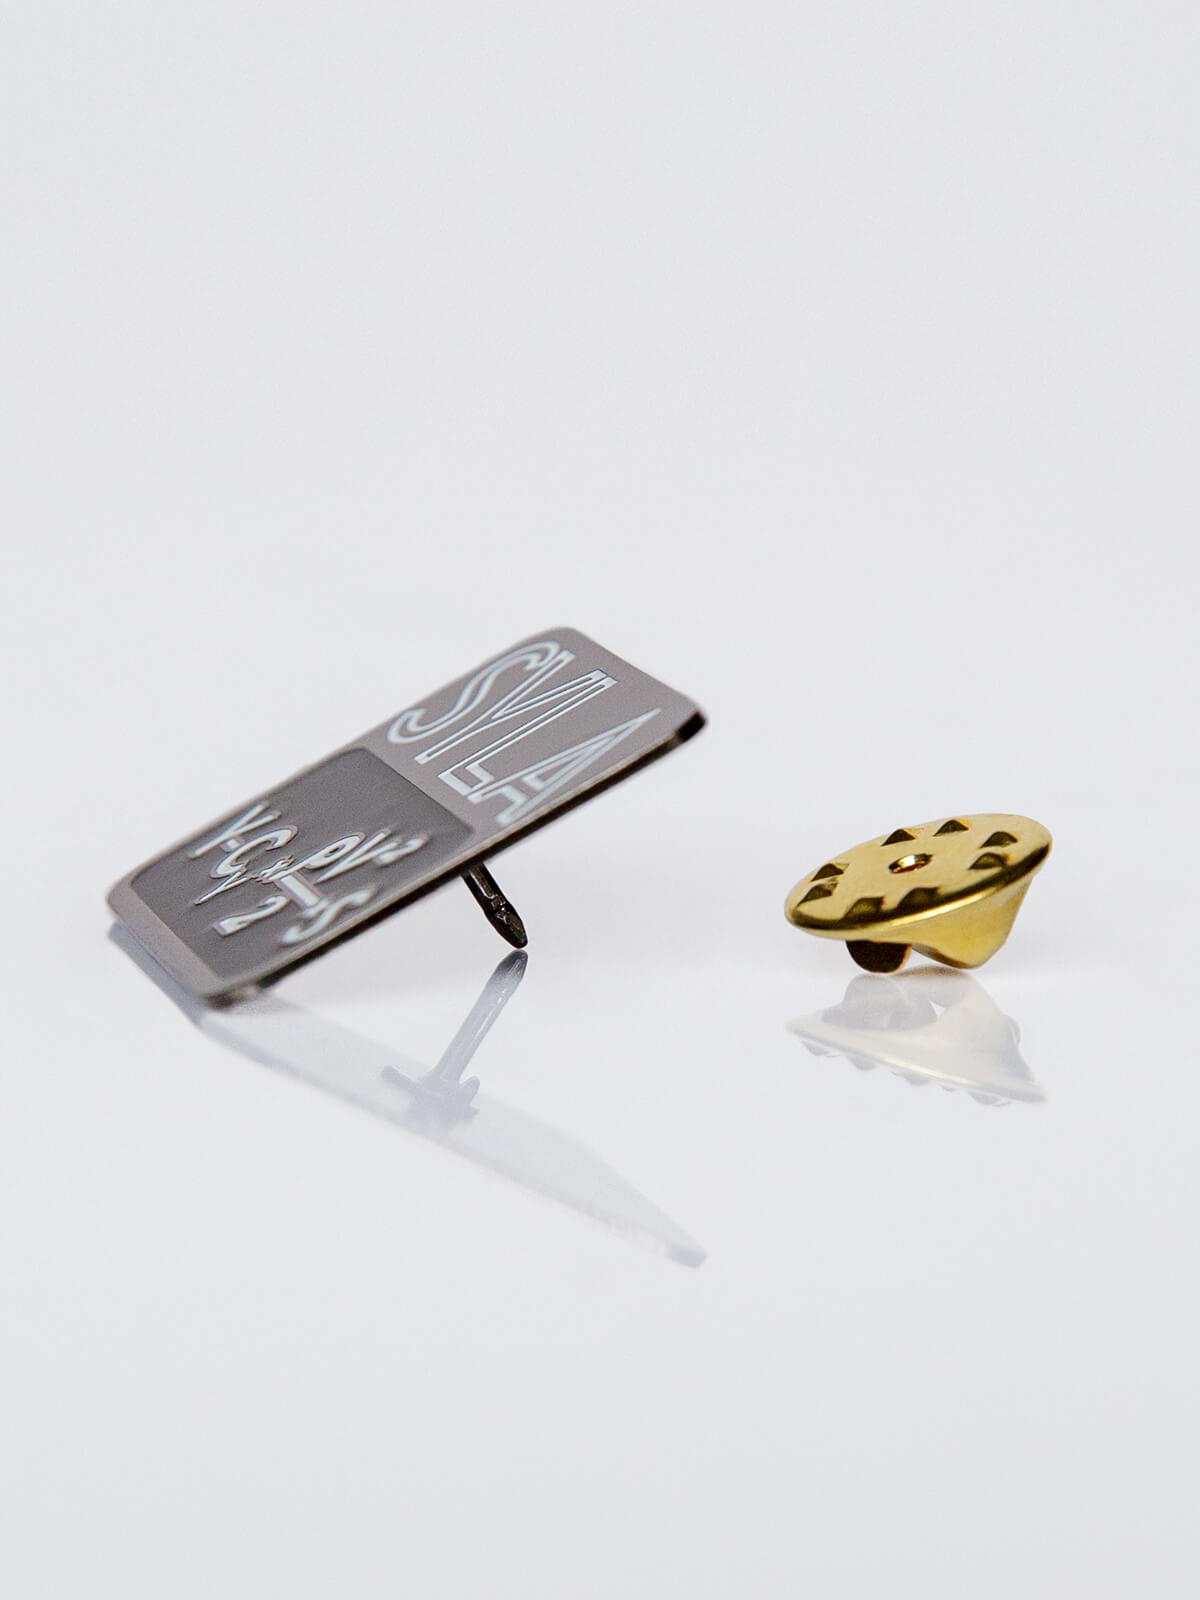 Pin Syla. Color black. 2.